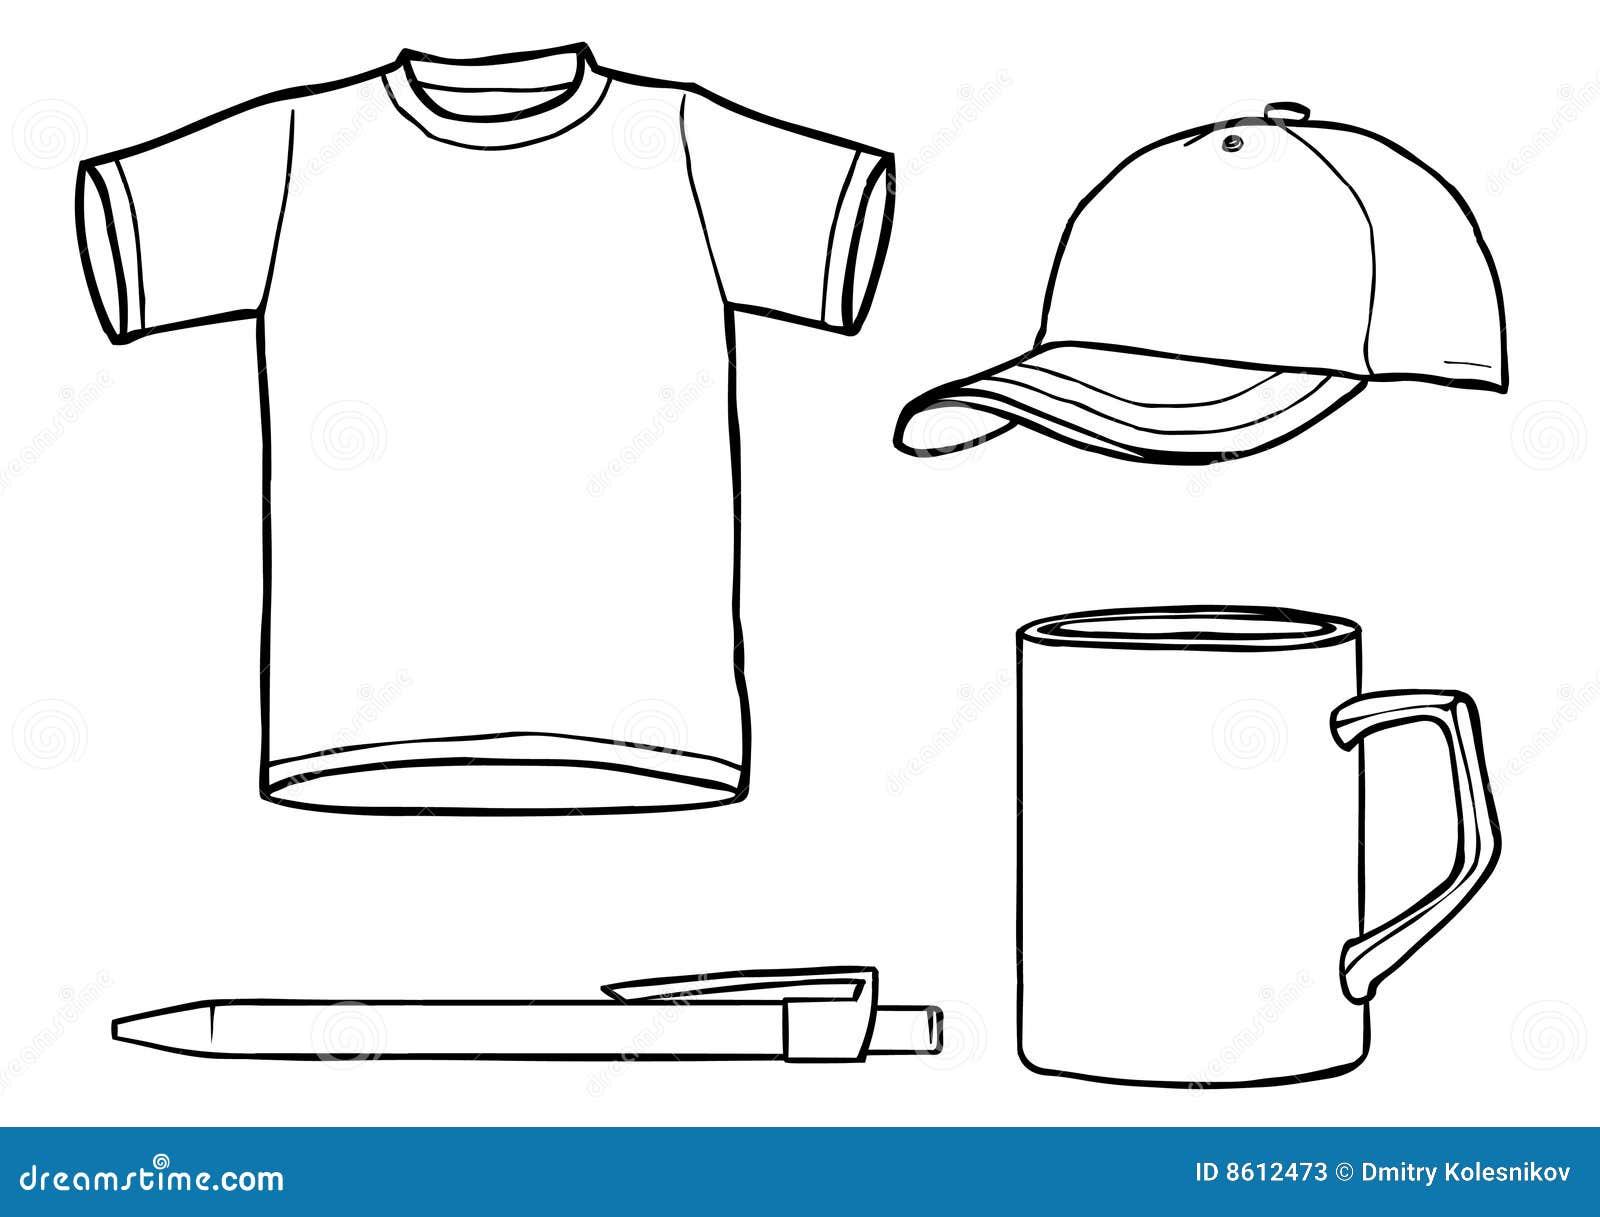 Coffee Mug Template Stock photos: outline template